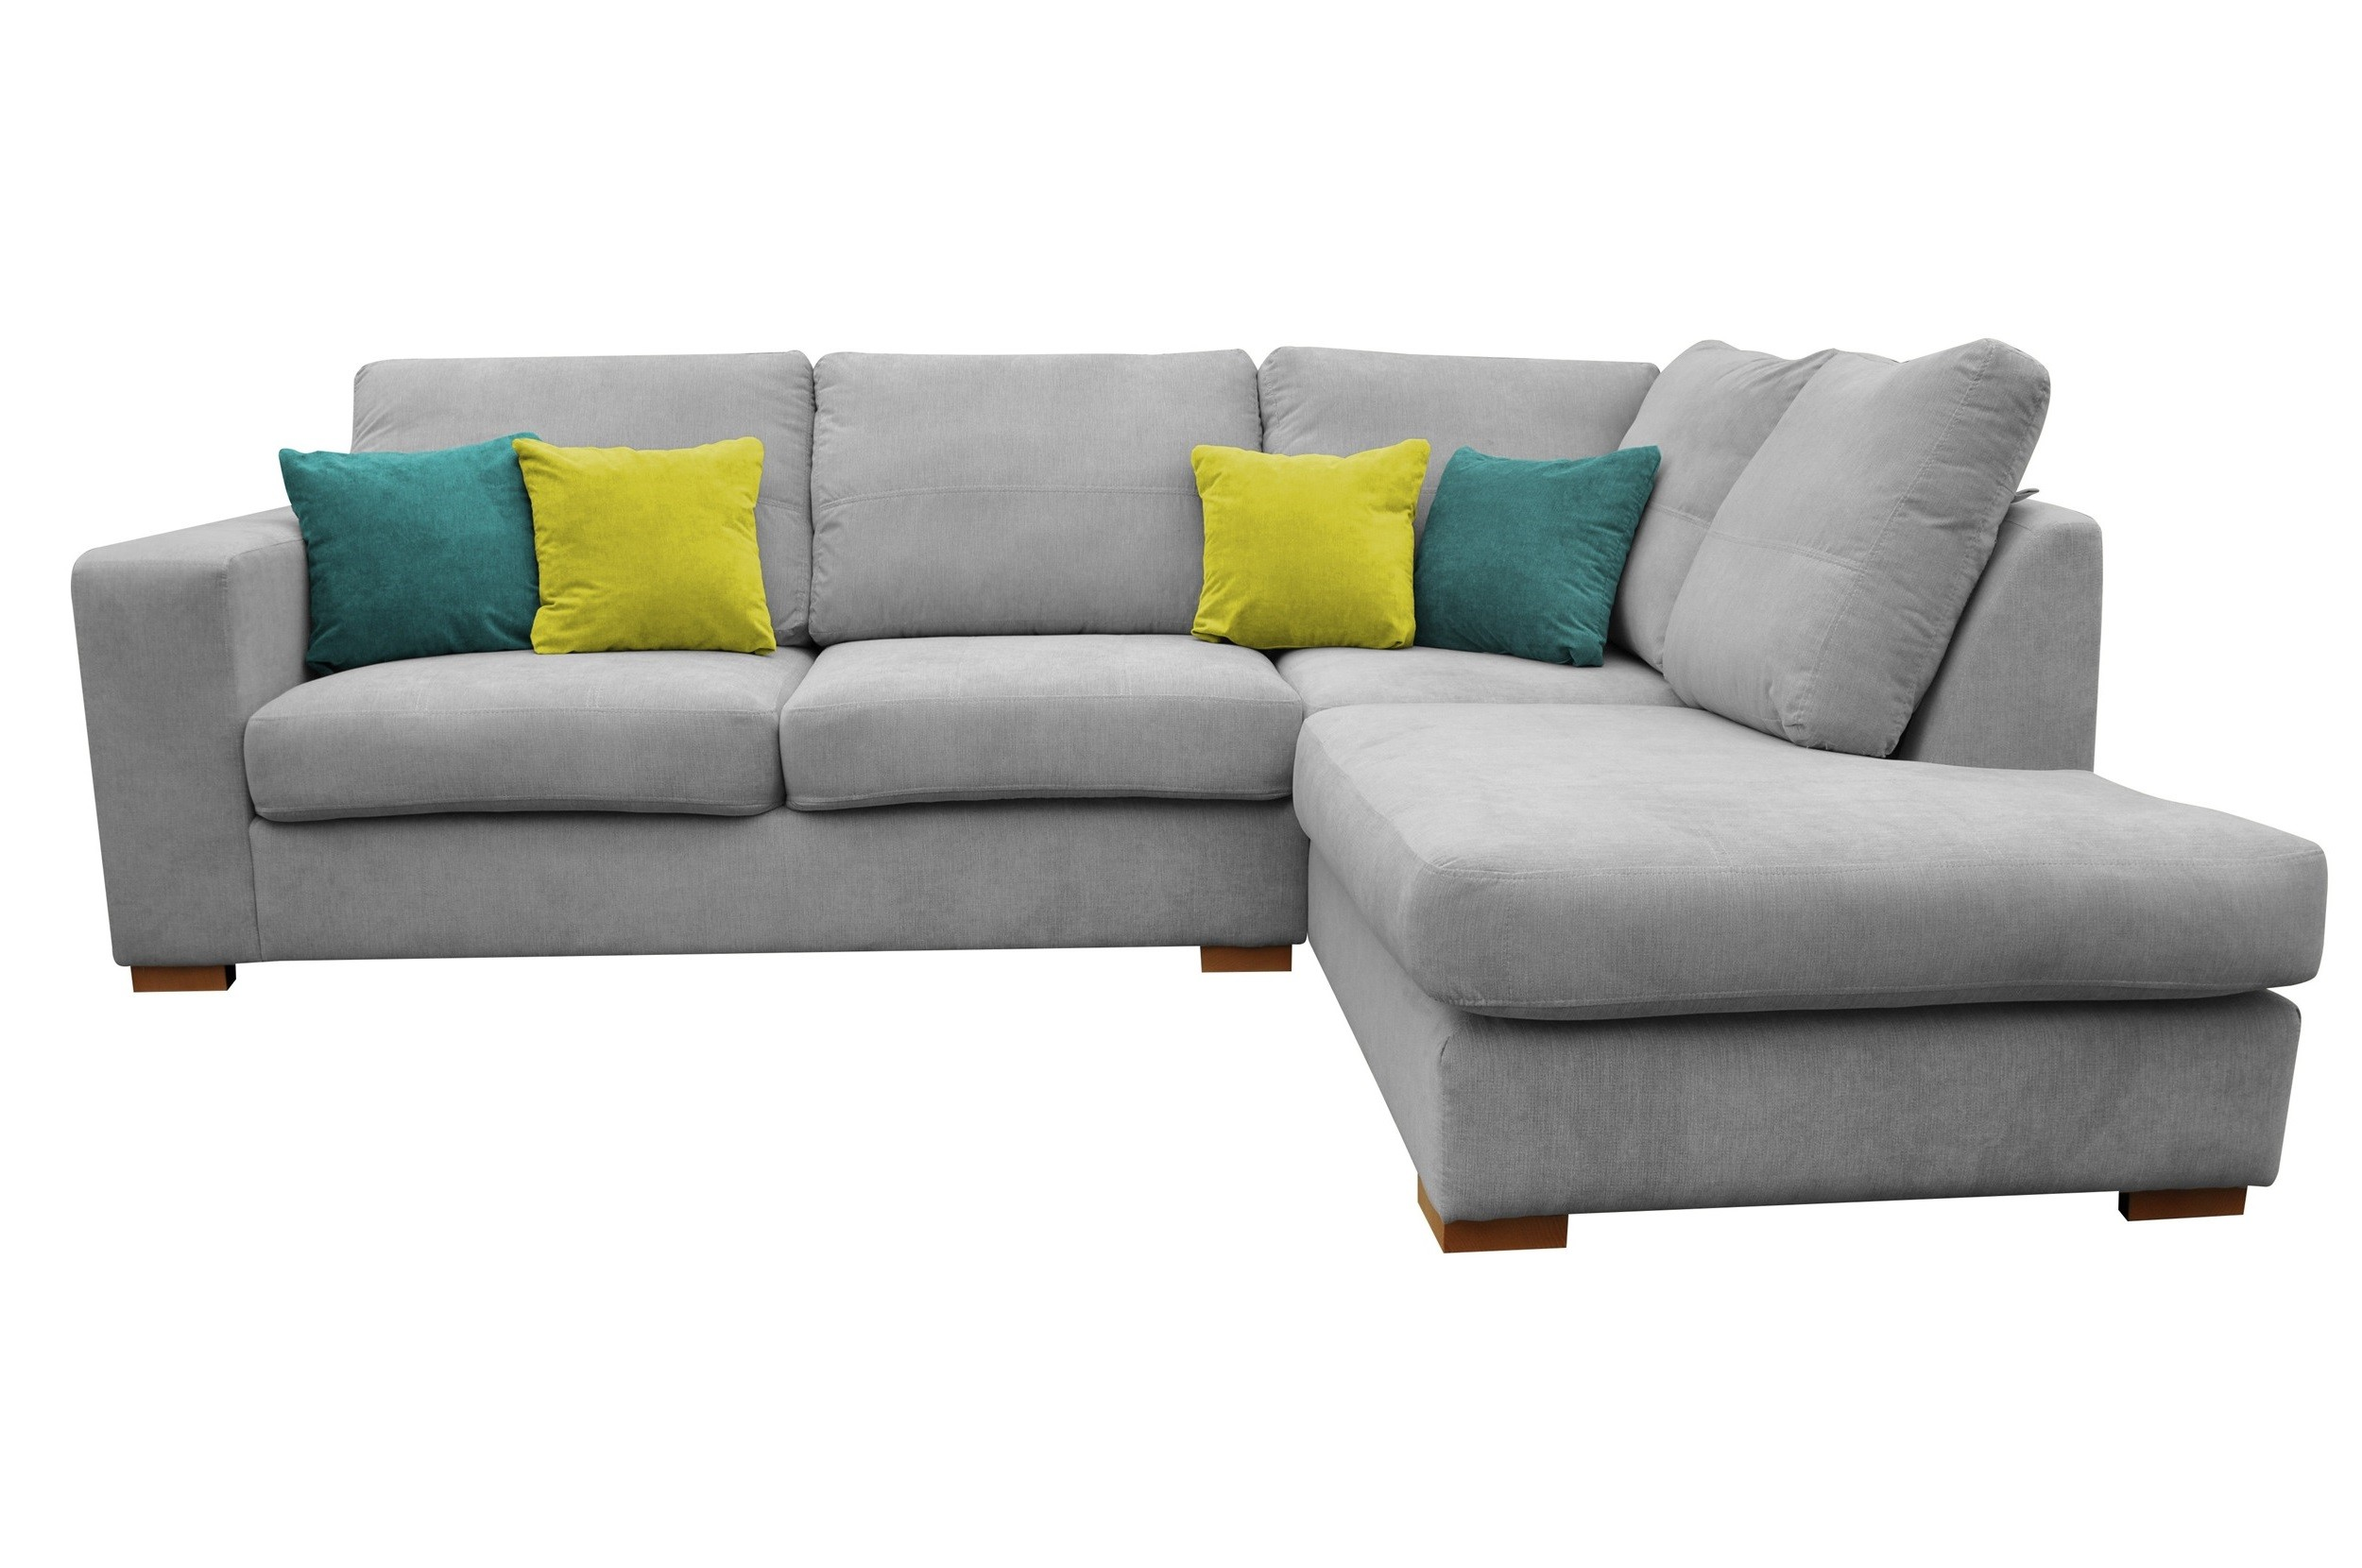 Layla Corner Sofa RHC Graphite